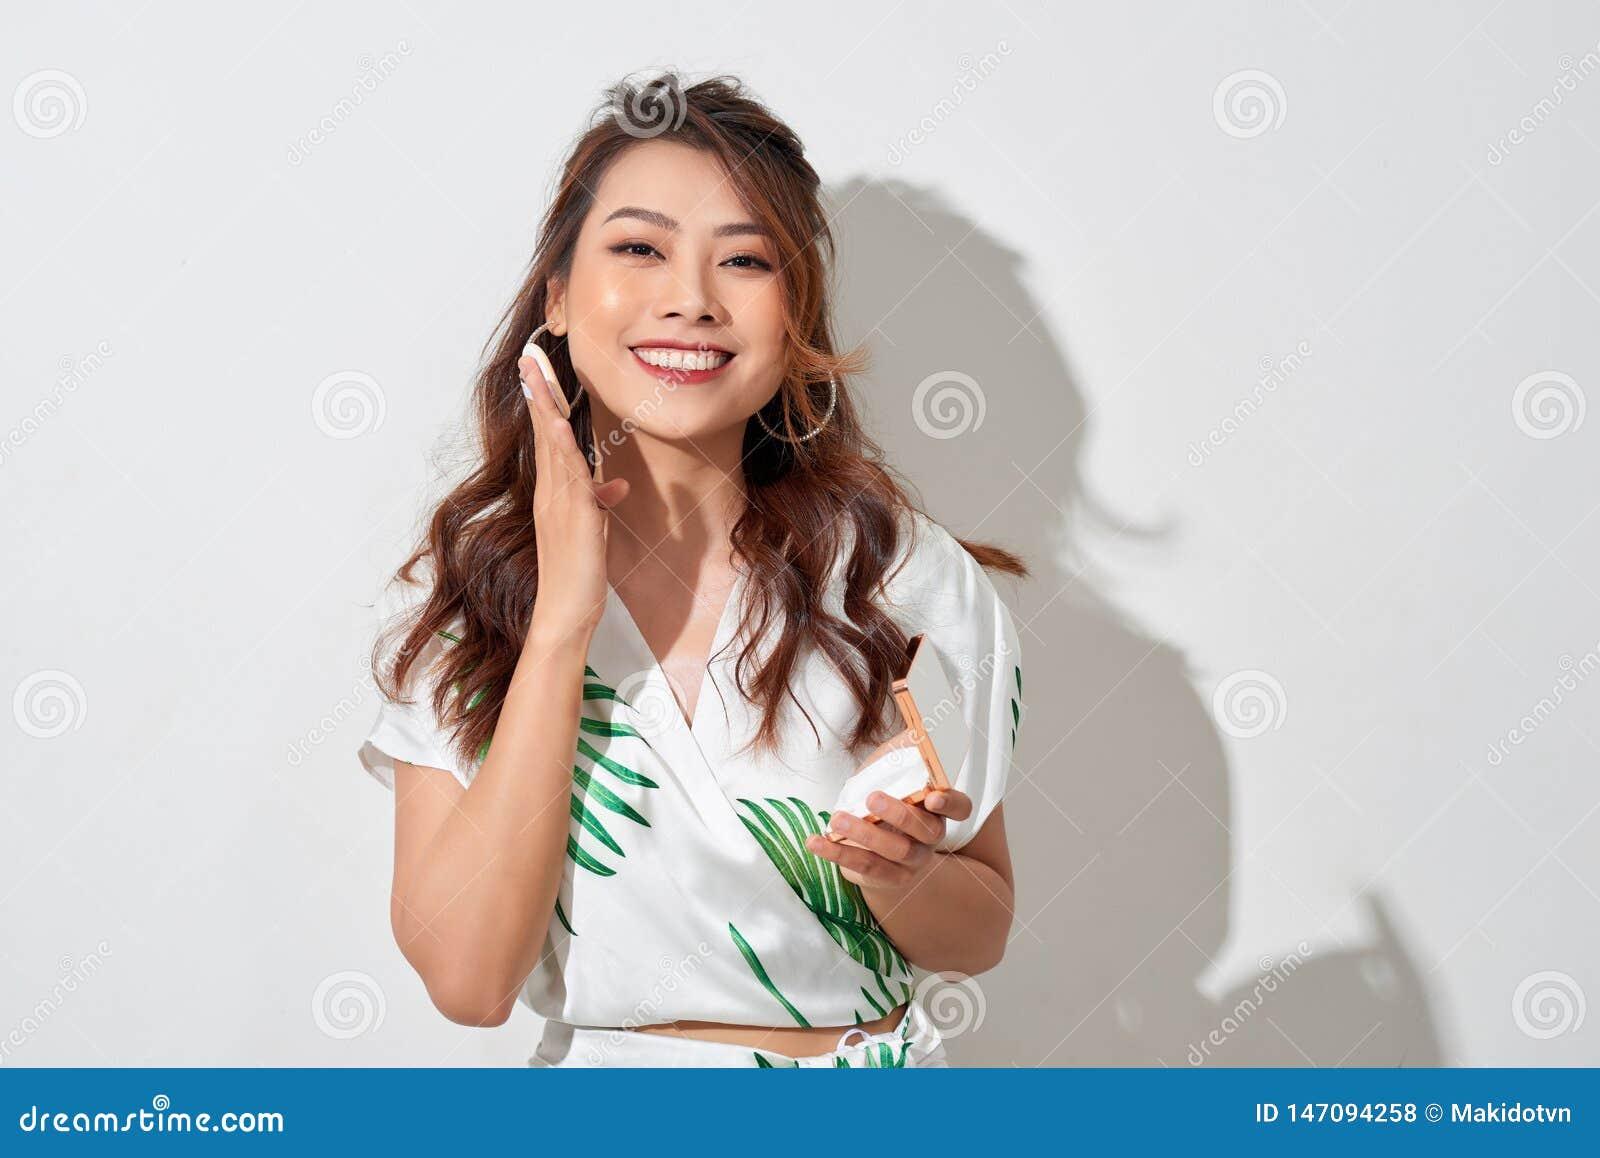 Mooi Aziatisch meisje in de zomerkleding die samenstelling met haar klein spiegel en poeder in zonnige middag doen